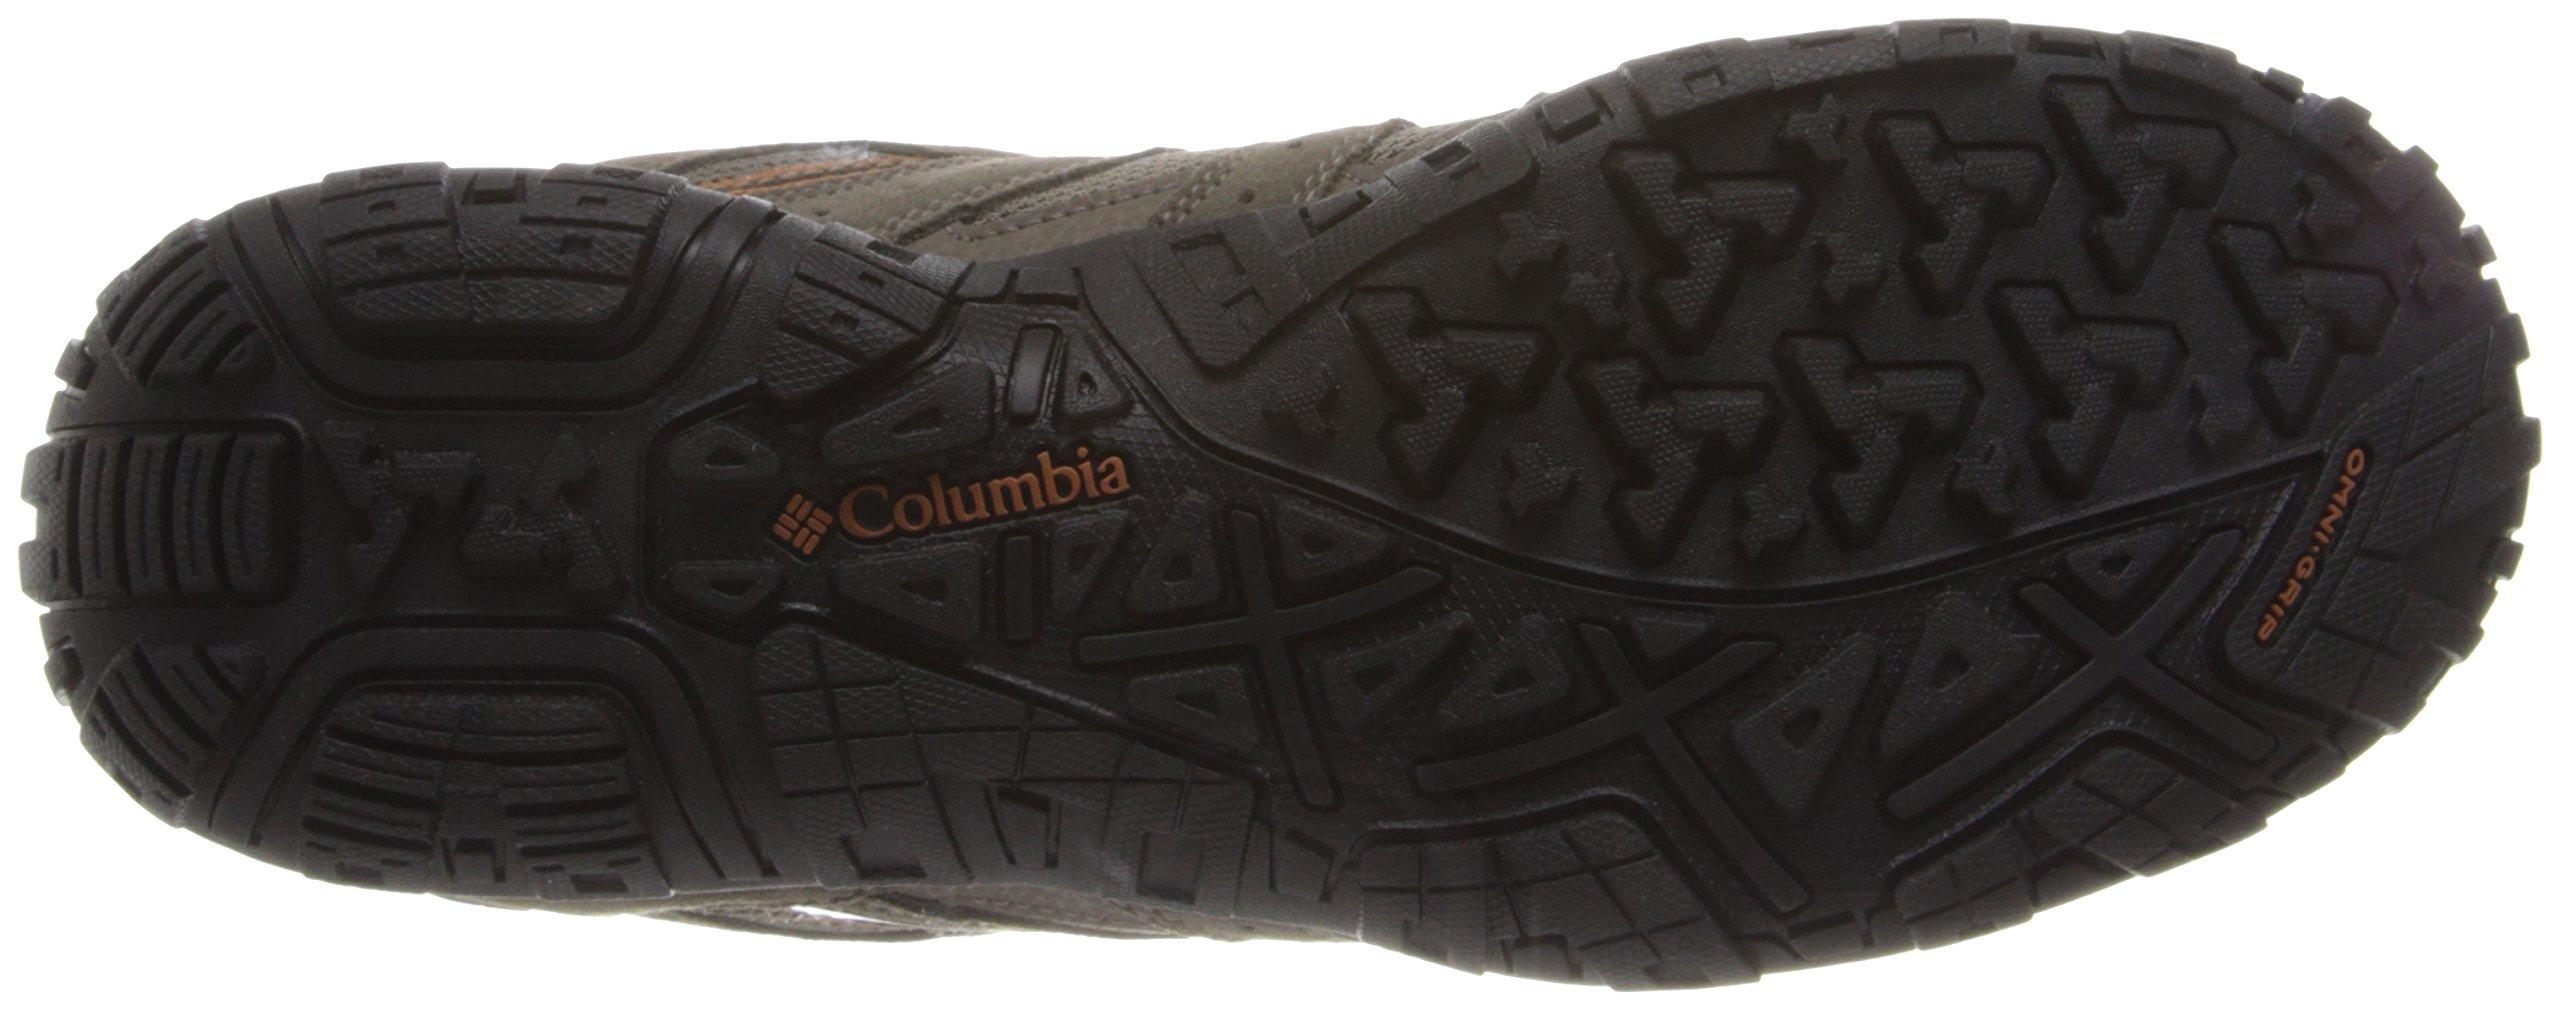 Columbia Men's Redmond Waterproof Hiking Shoe Pebble, Dark Ginger 7 D US by Columbia (Image #3)